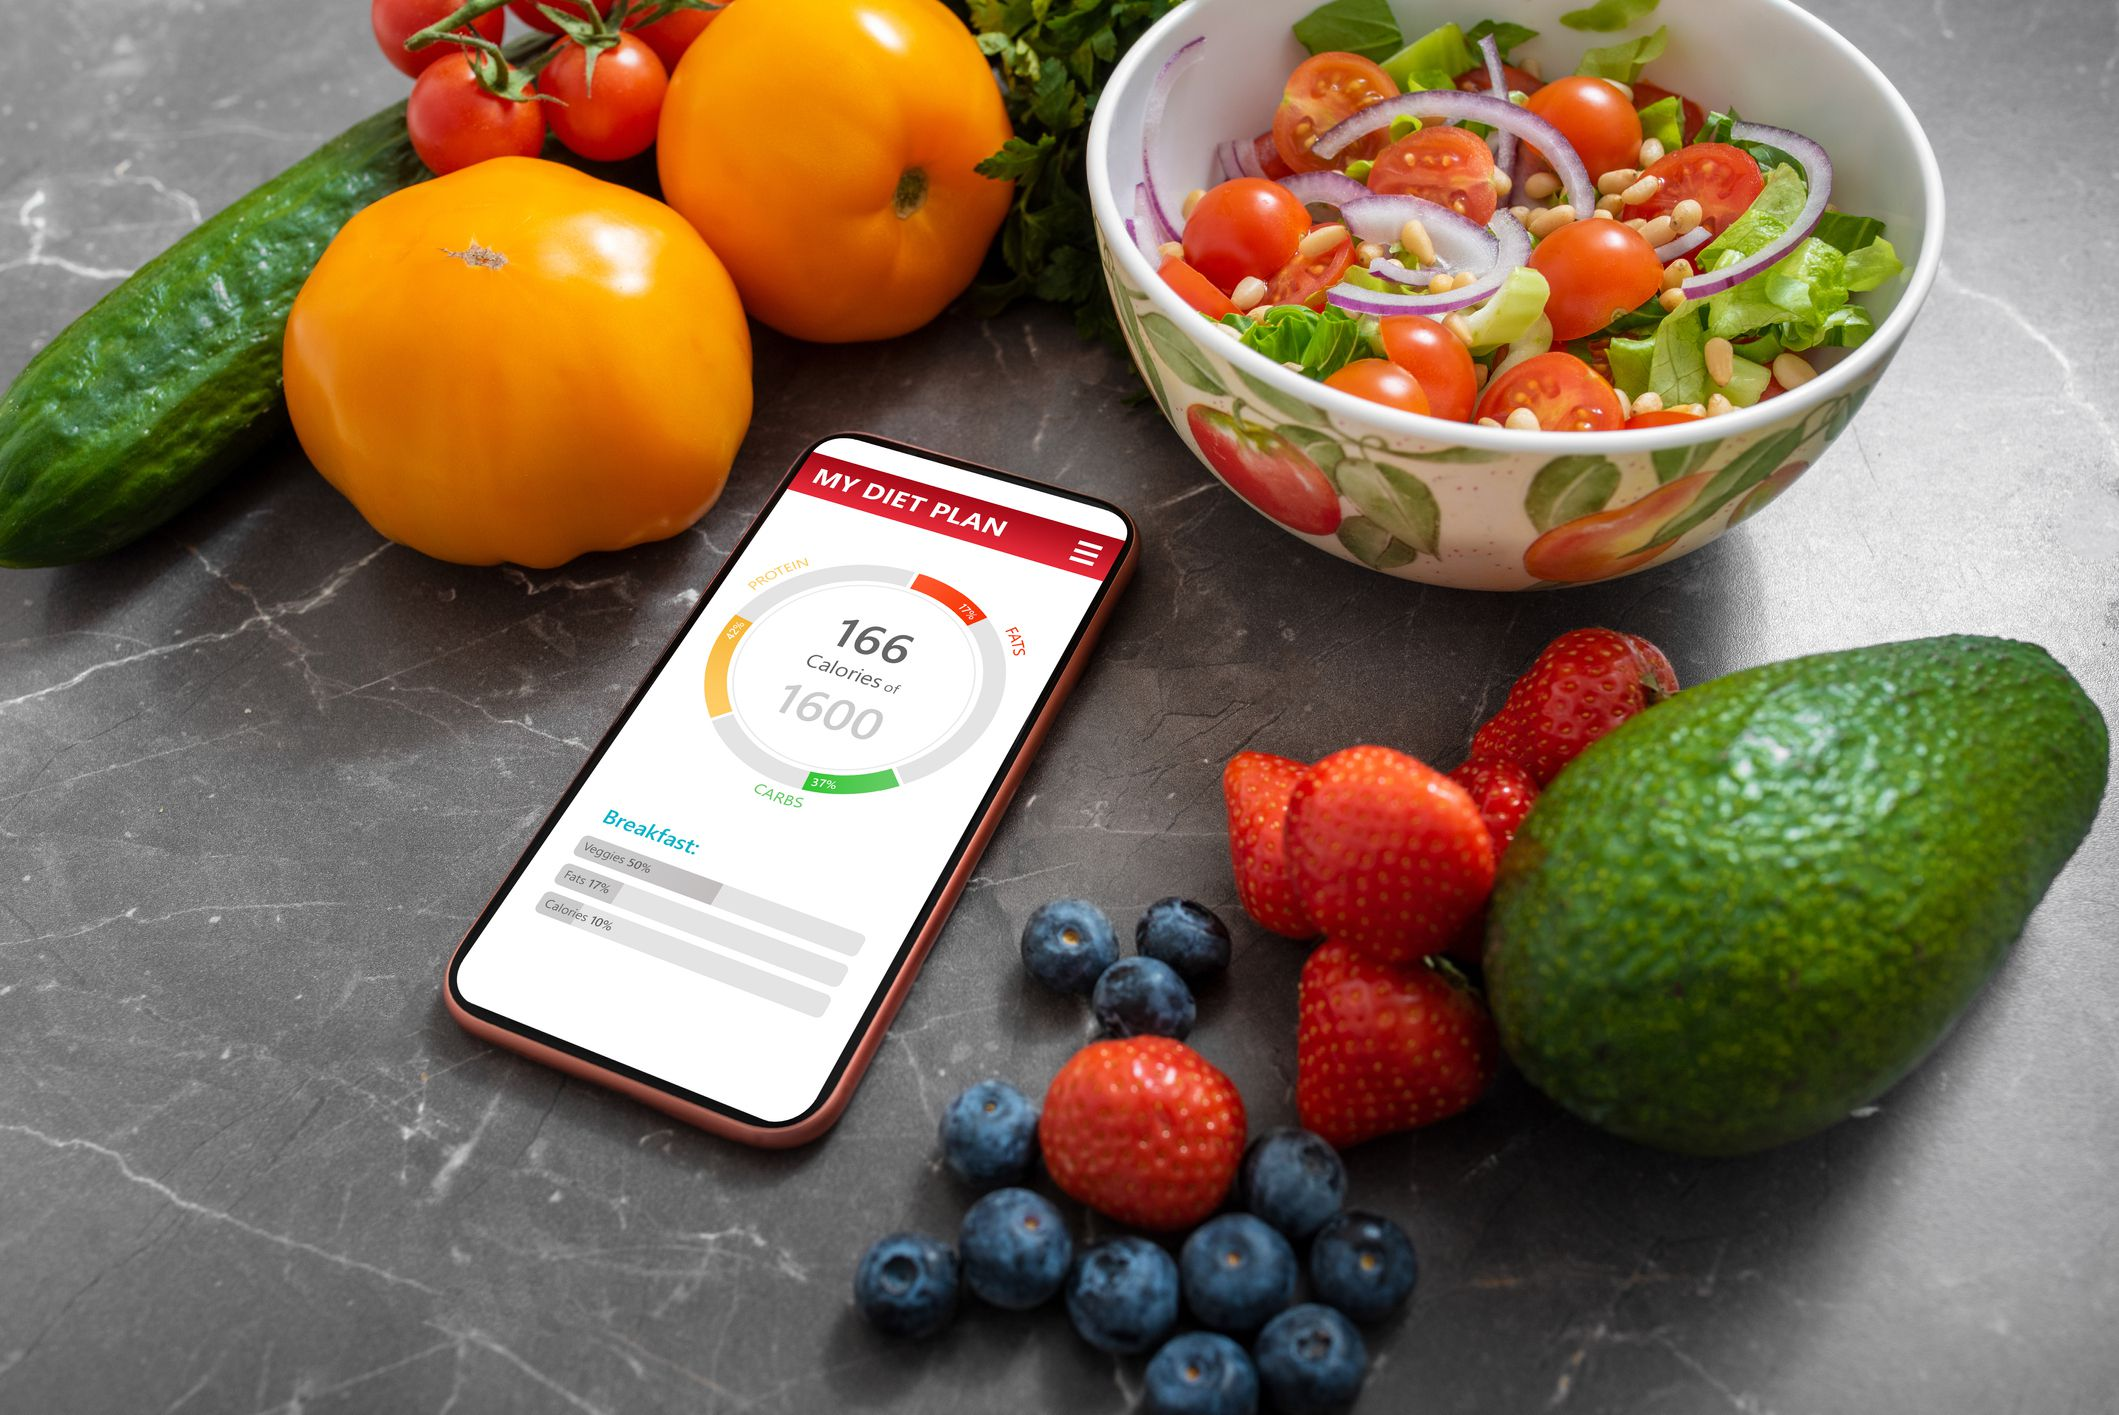 The 9 Best Keto Diet Apps of 2020